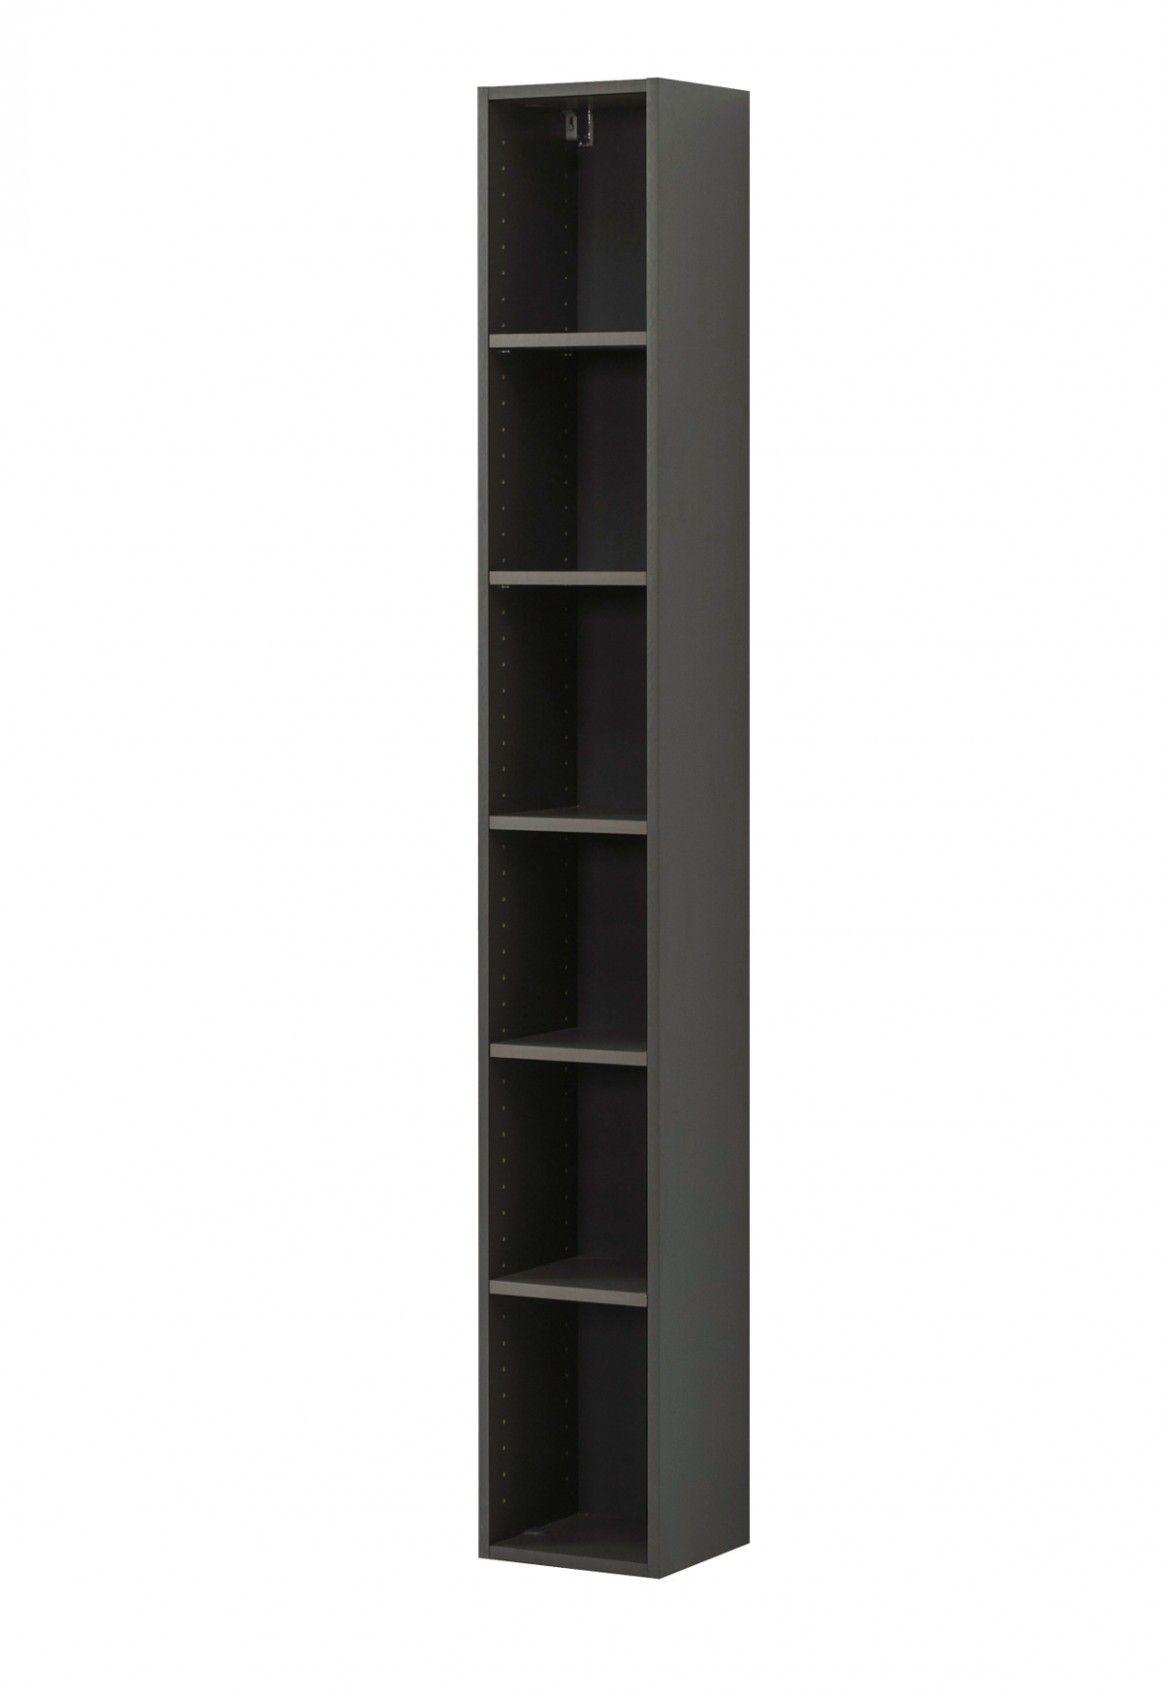 Badezimmer Regal Grau Tall Cabinet Storage Storage Cabinet Tall Storage